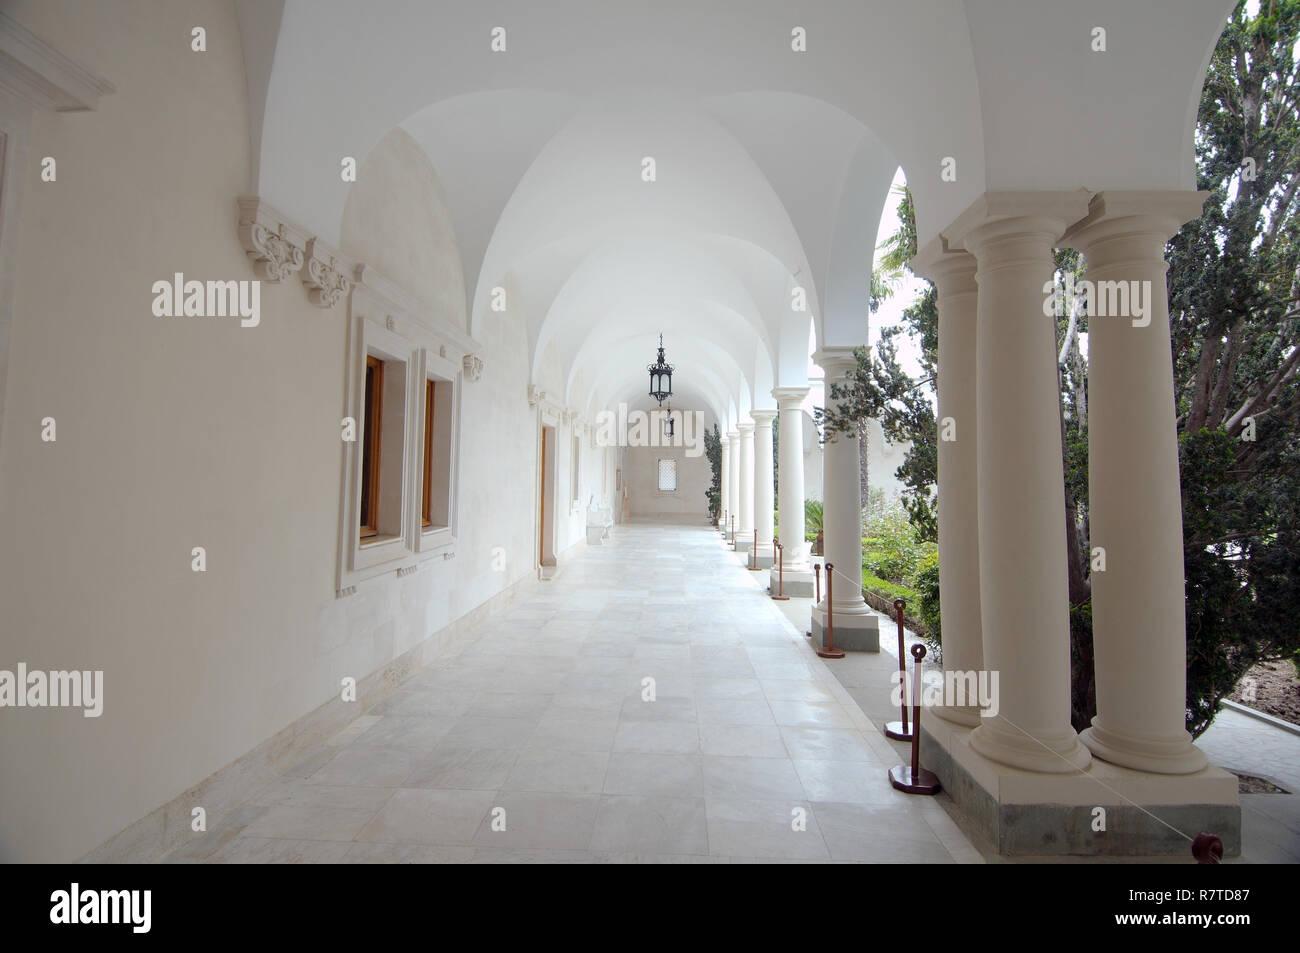 Italian courtyard of Livadia Palace, Livadiya, Yalta, Crimea, Ukraine - Stock Image